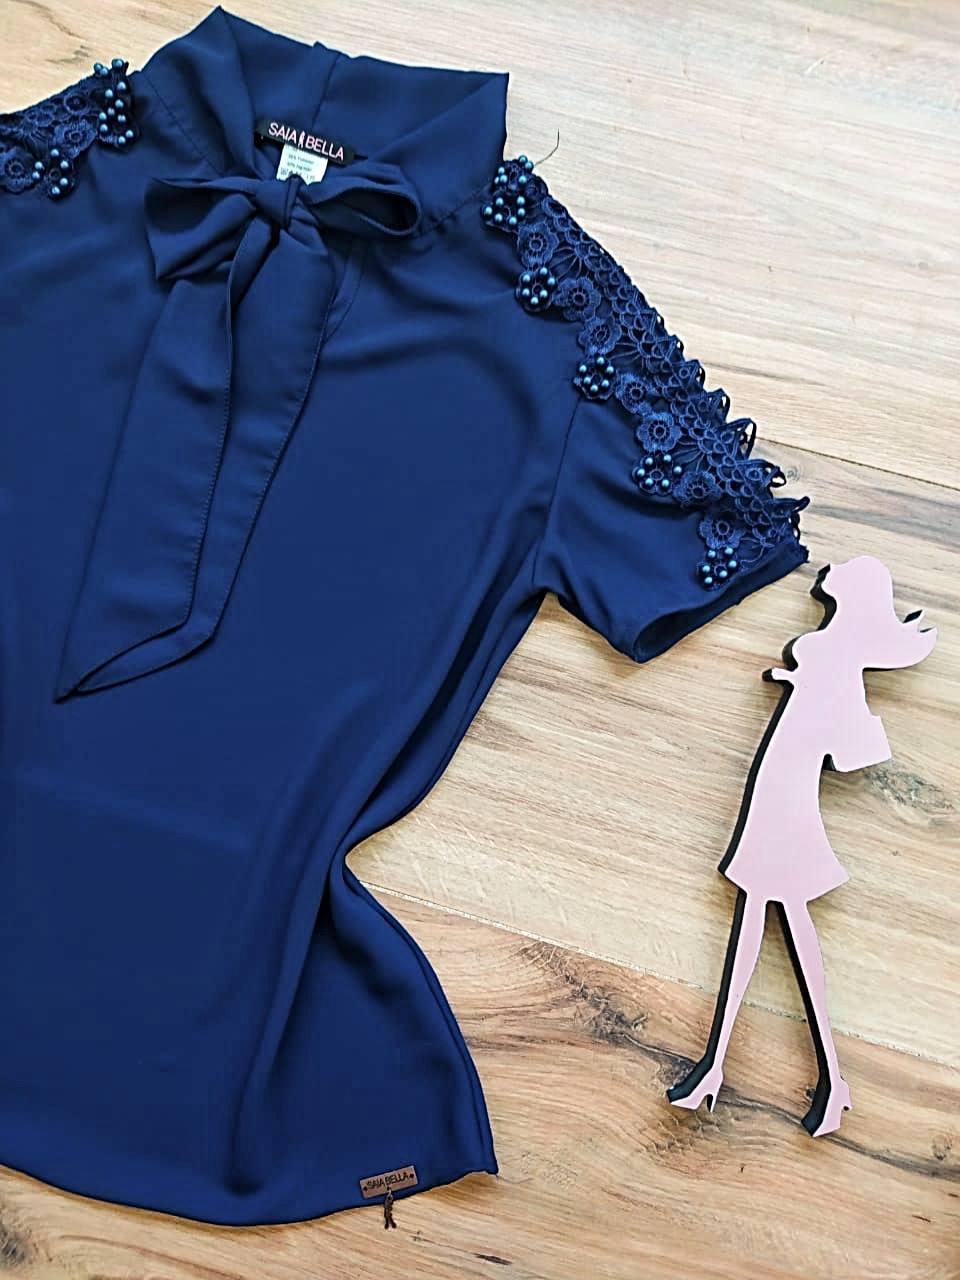 Blusa Stephany Saia Bella - SB9823 Azul Marinho